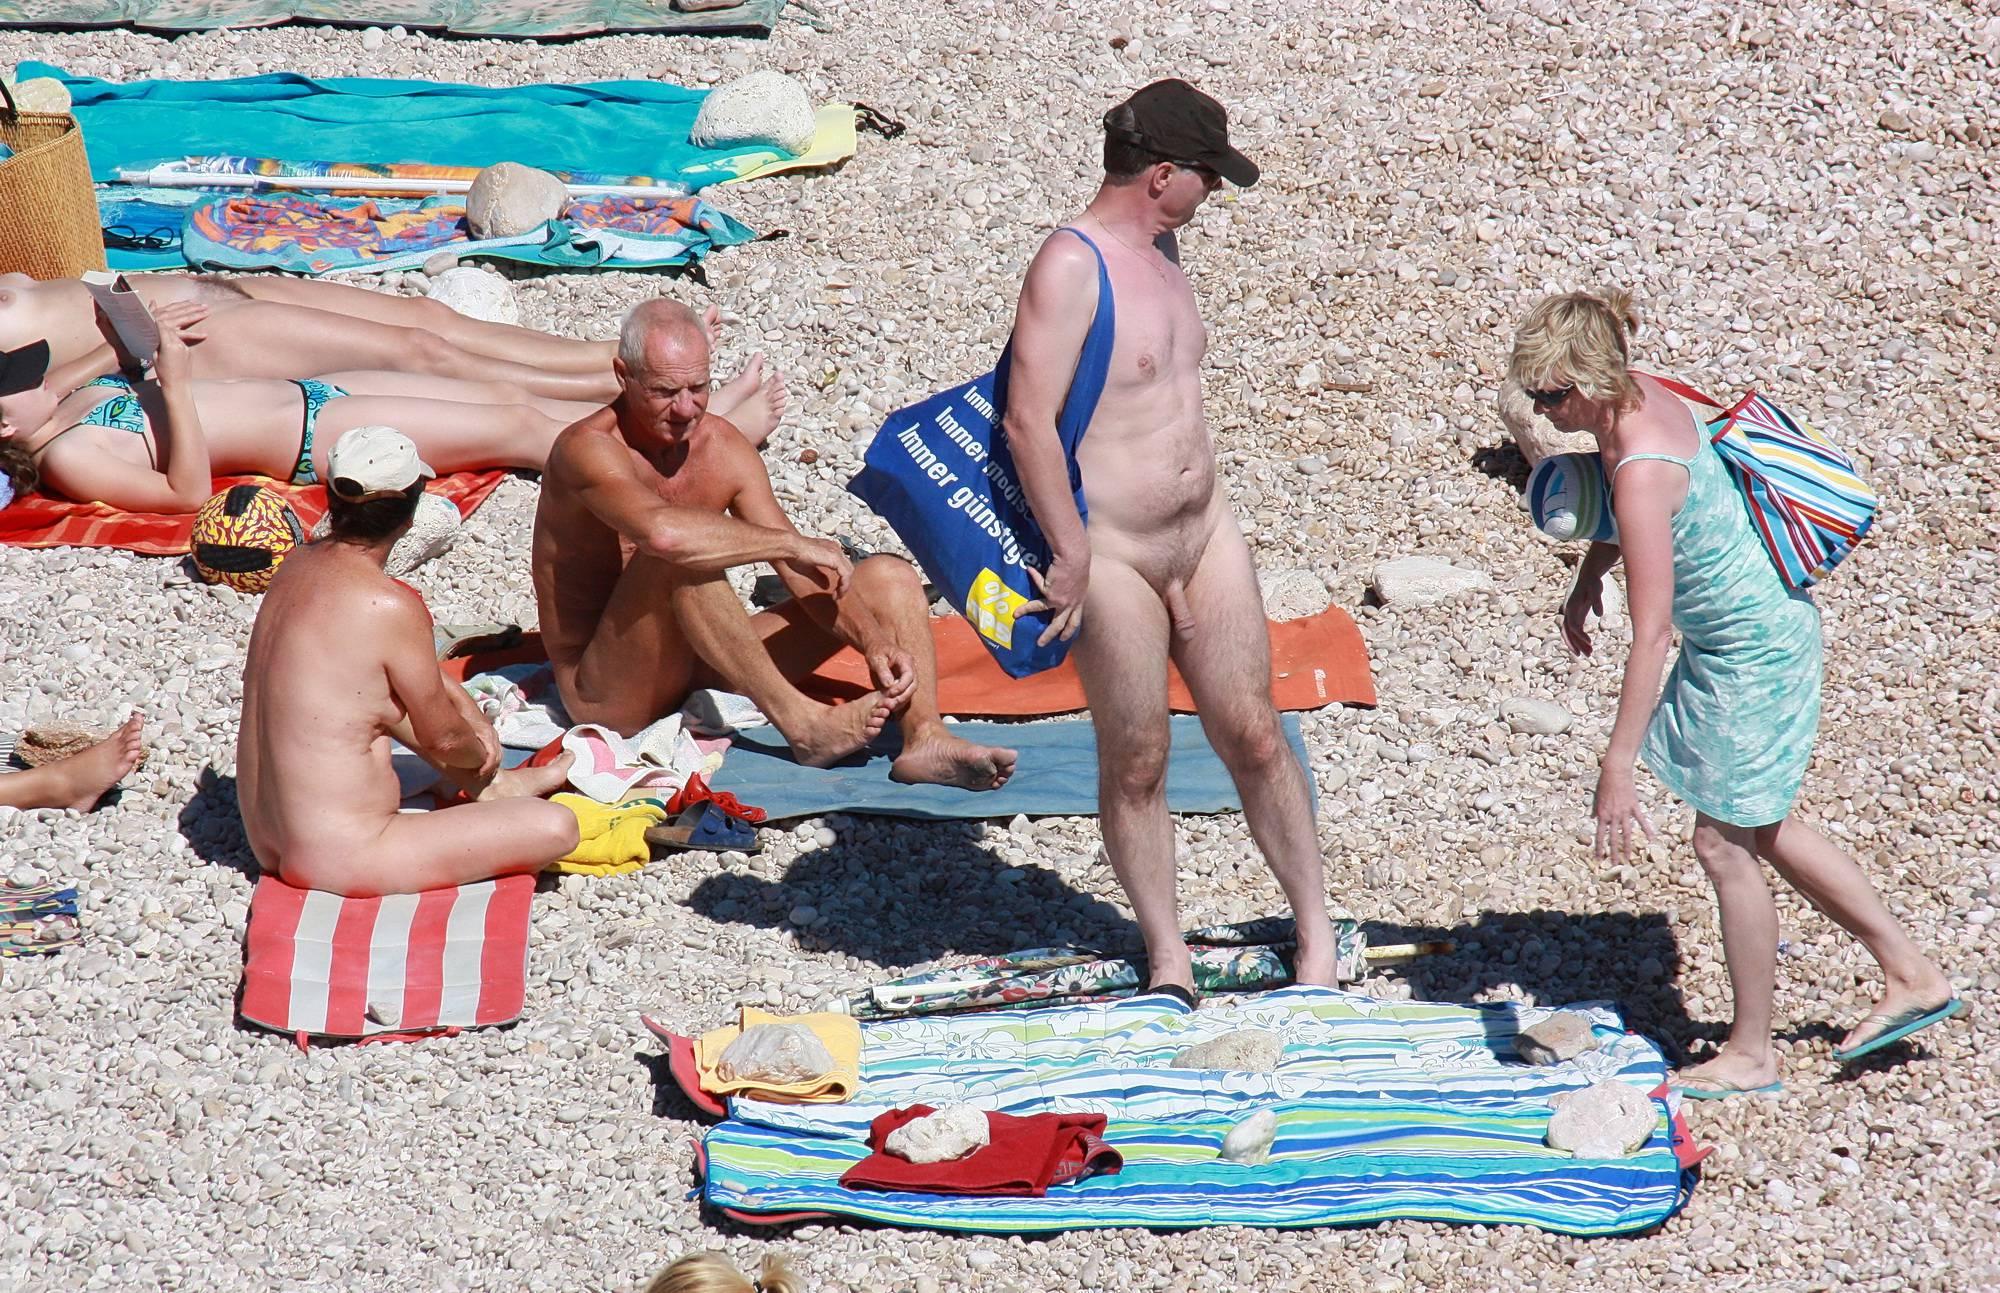 Nudist Photos Beachy Keen Summer Day - 2